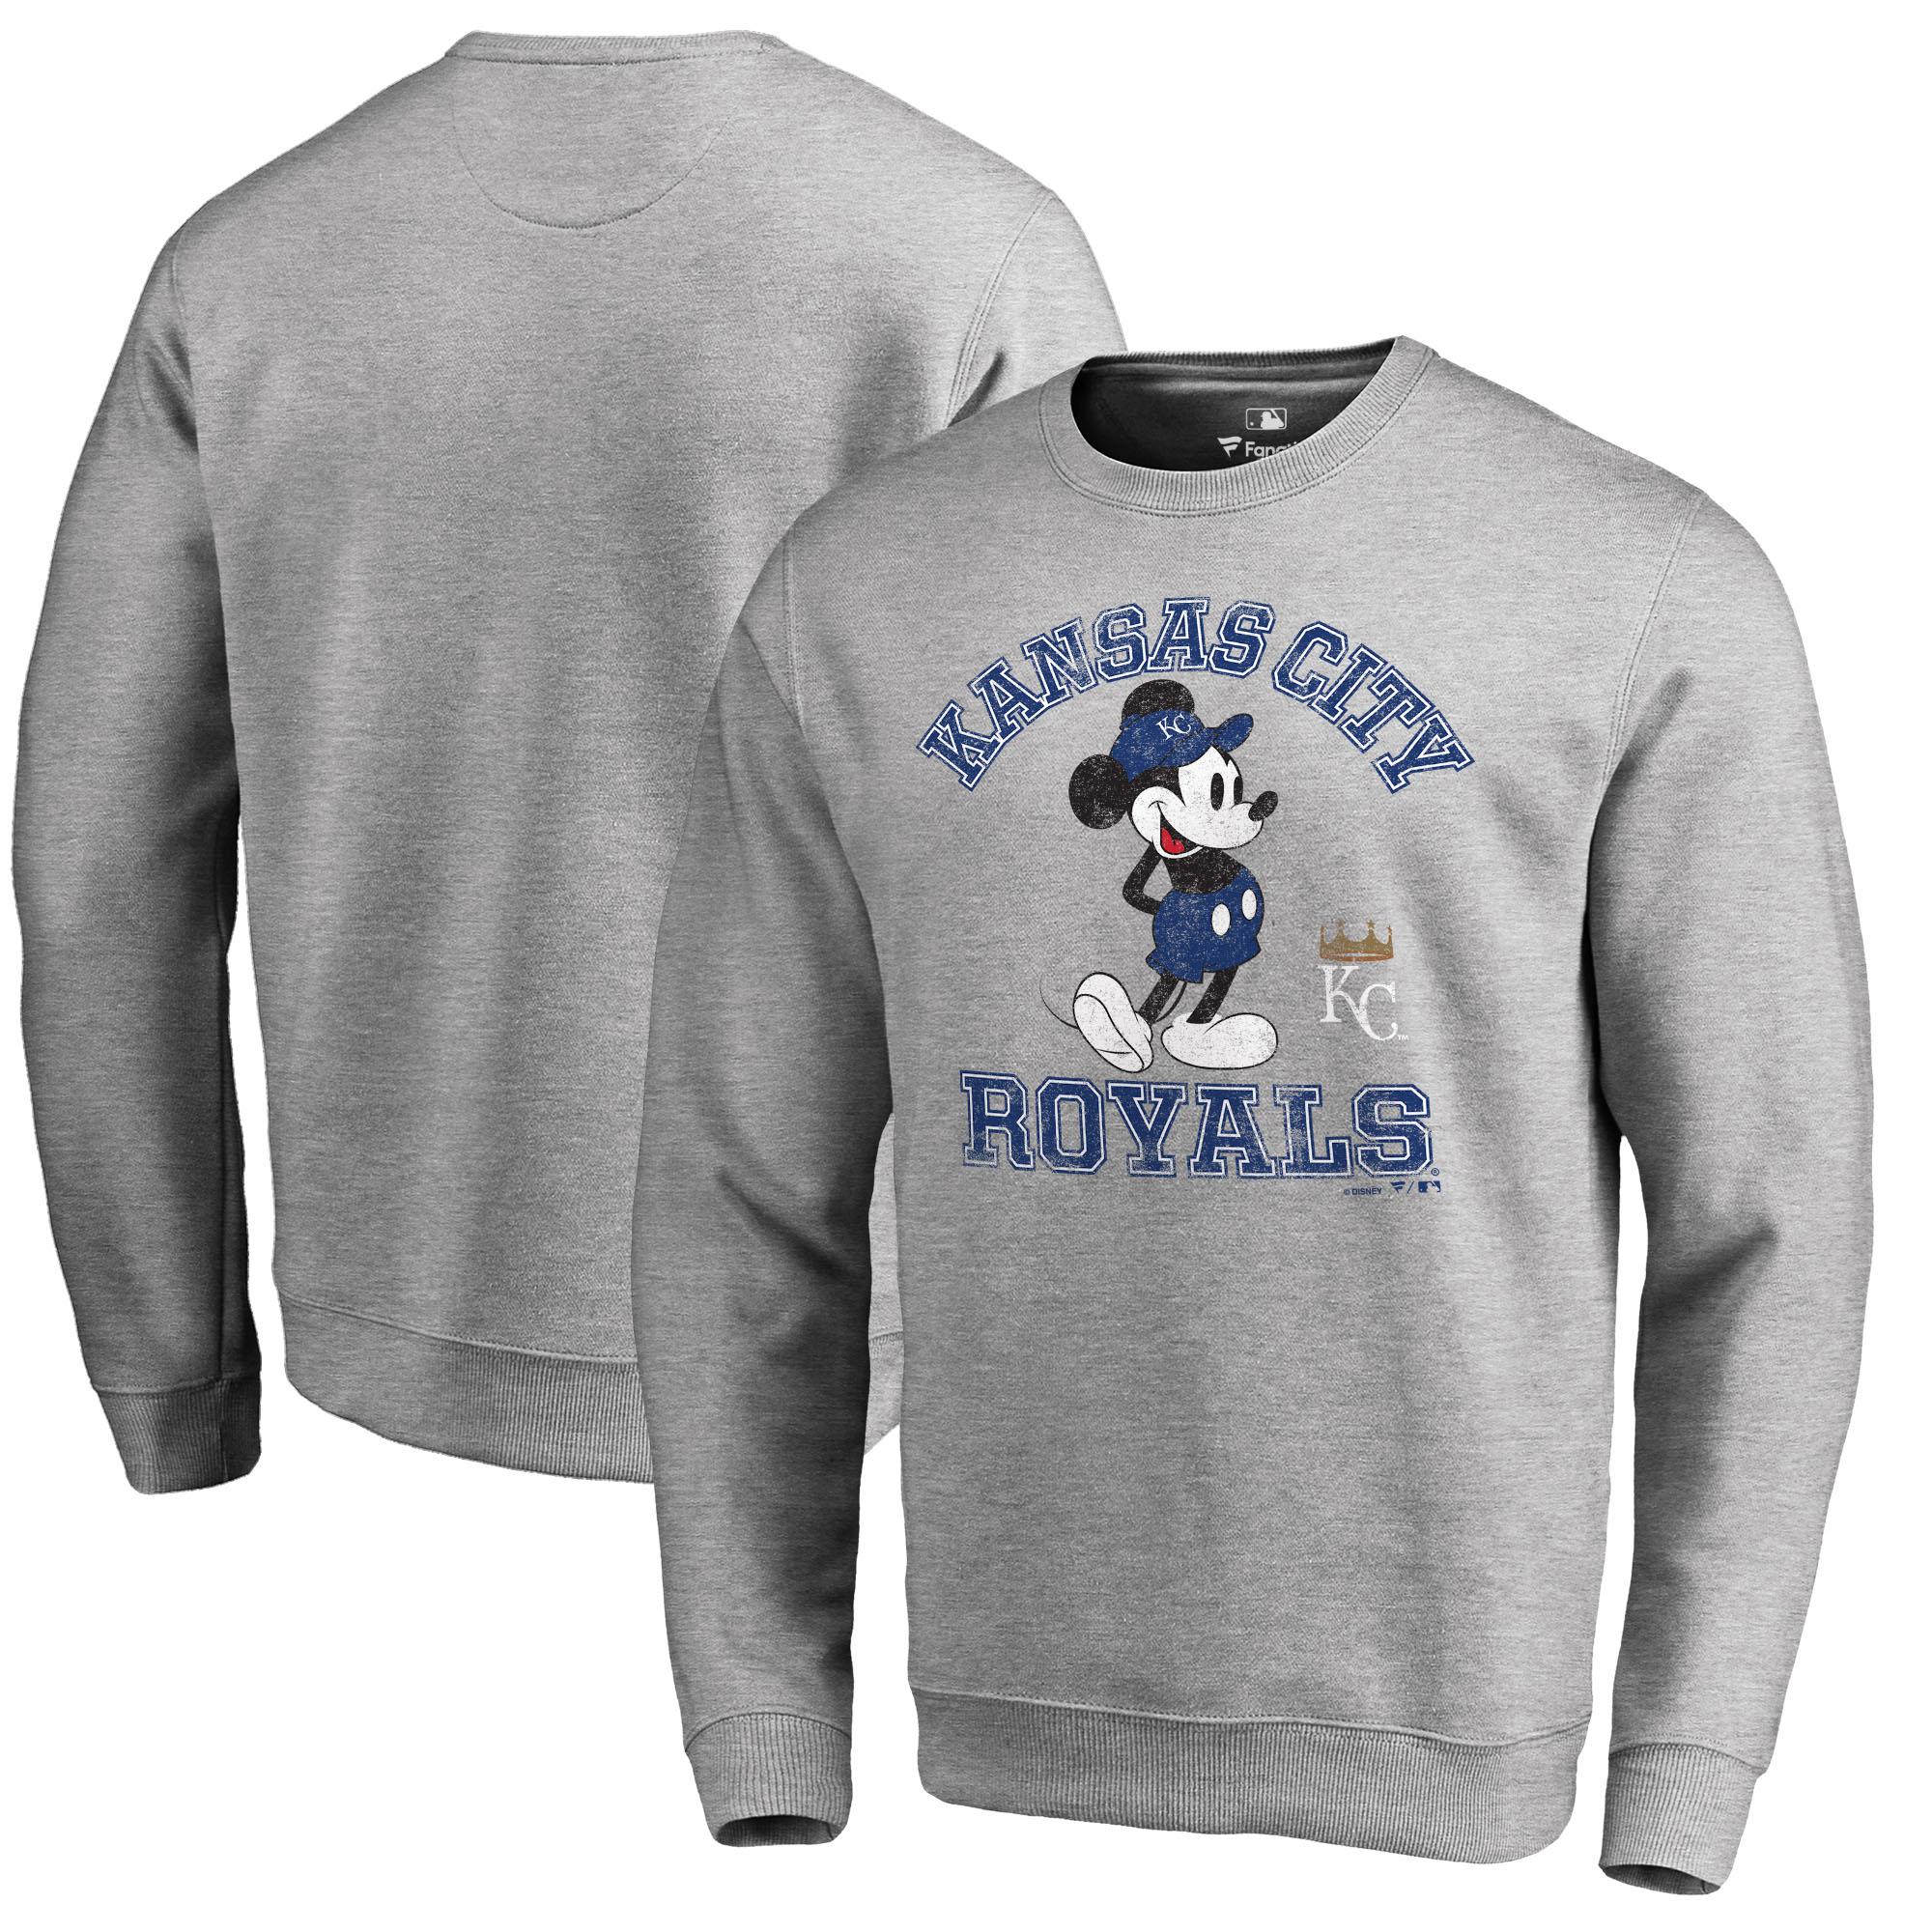 Kansas City Royals Fanatics Branded Disney MLB Tradition Pullover Sweatshirt - Heathered Gray